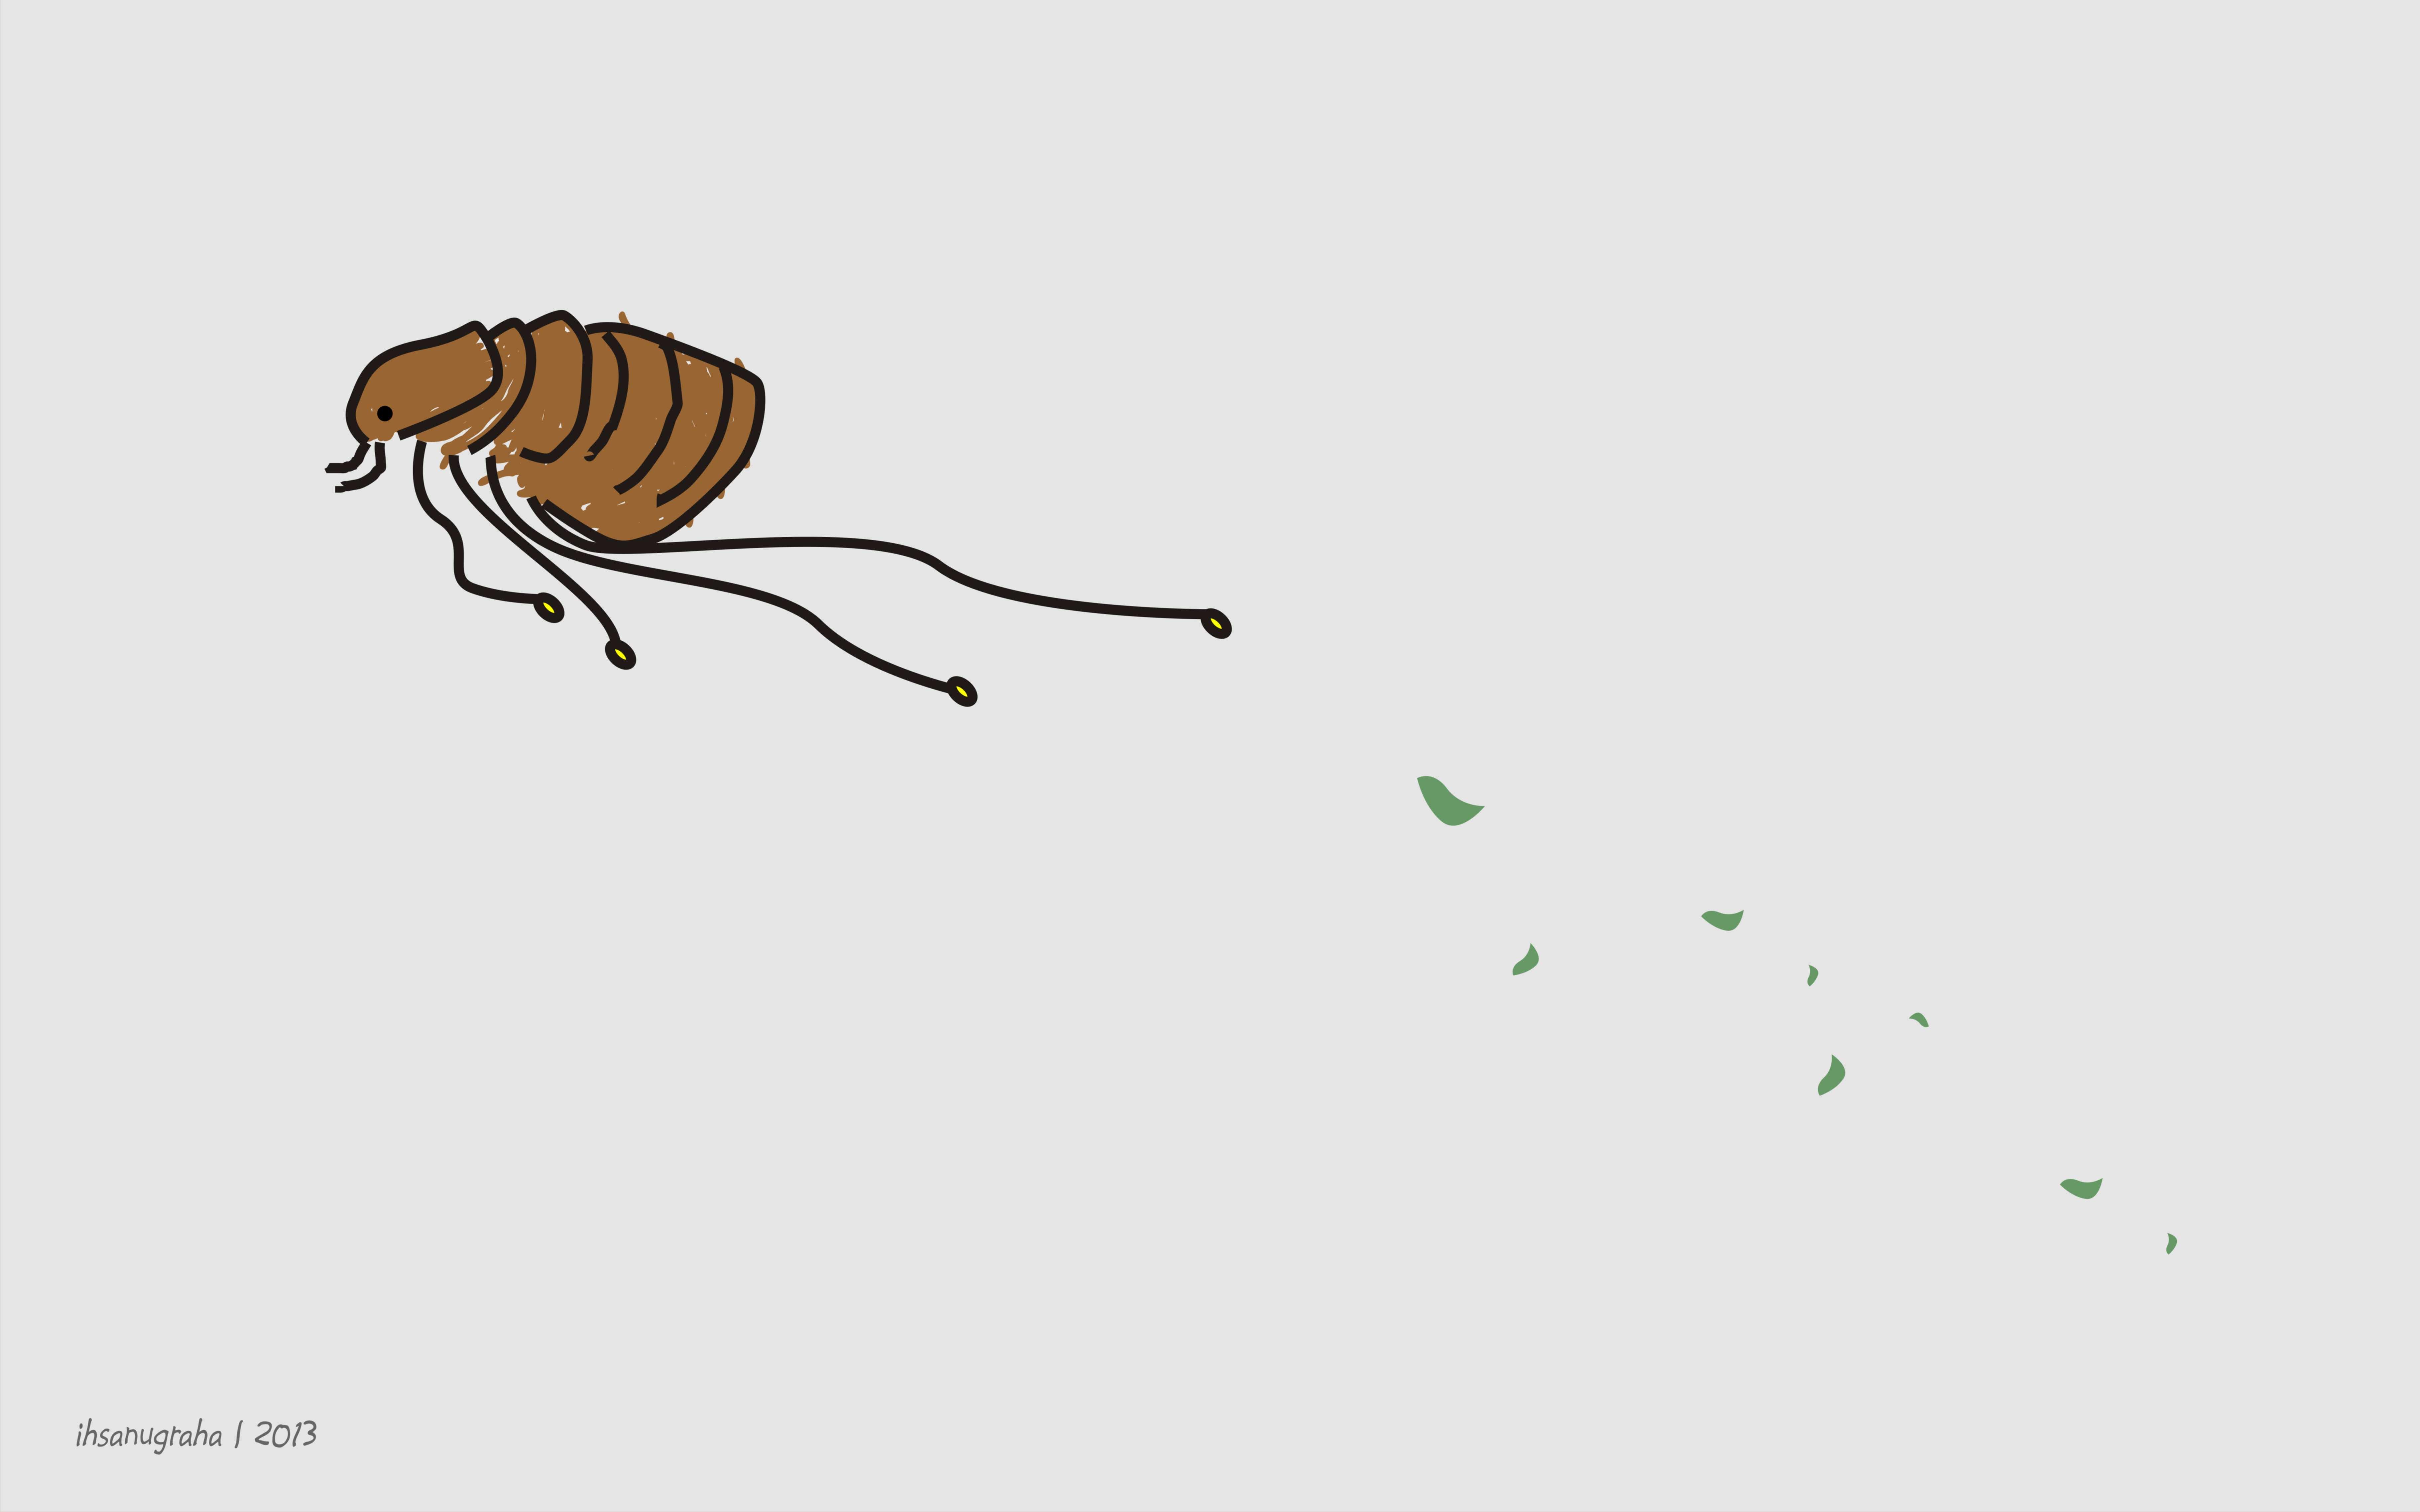 Animasi Kartun Kelinci Gambar Kartun